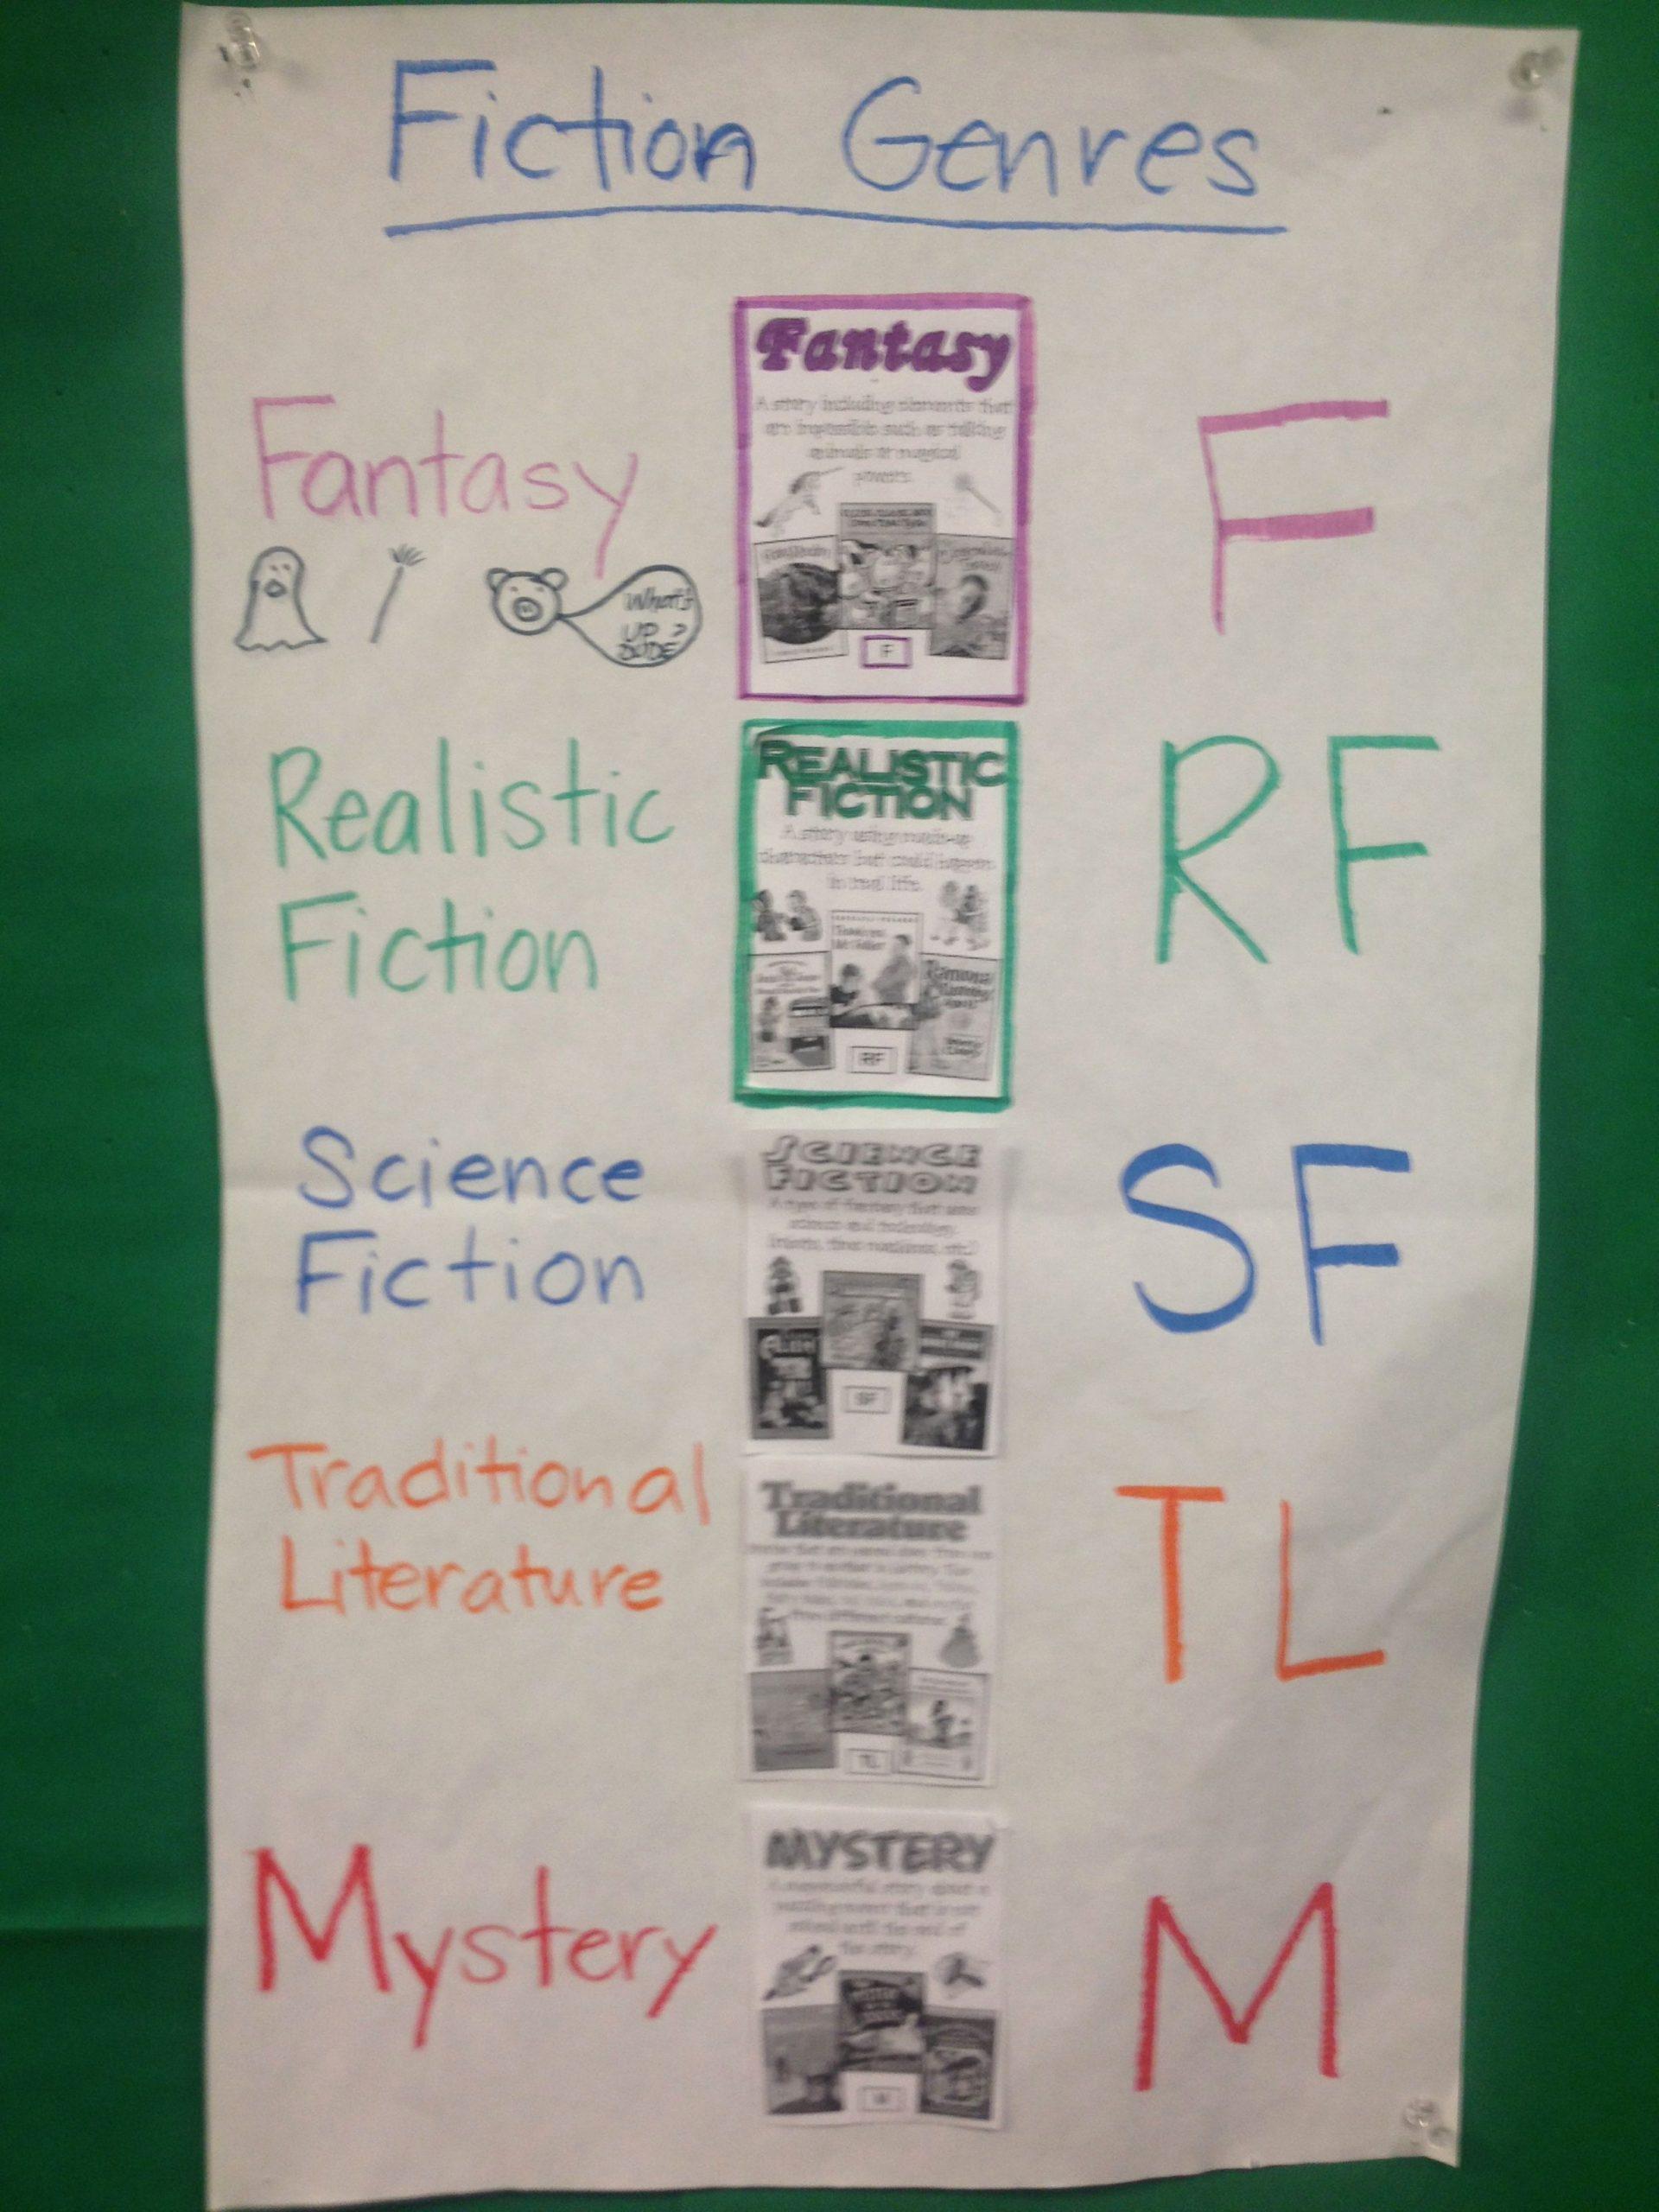 Genre Worksheets 4th Grade Unique Fiction Genres